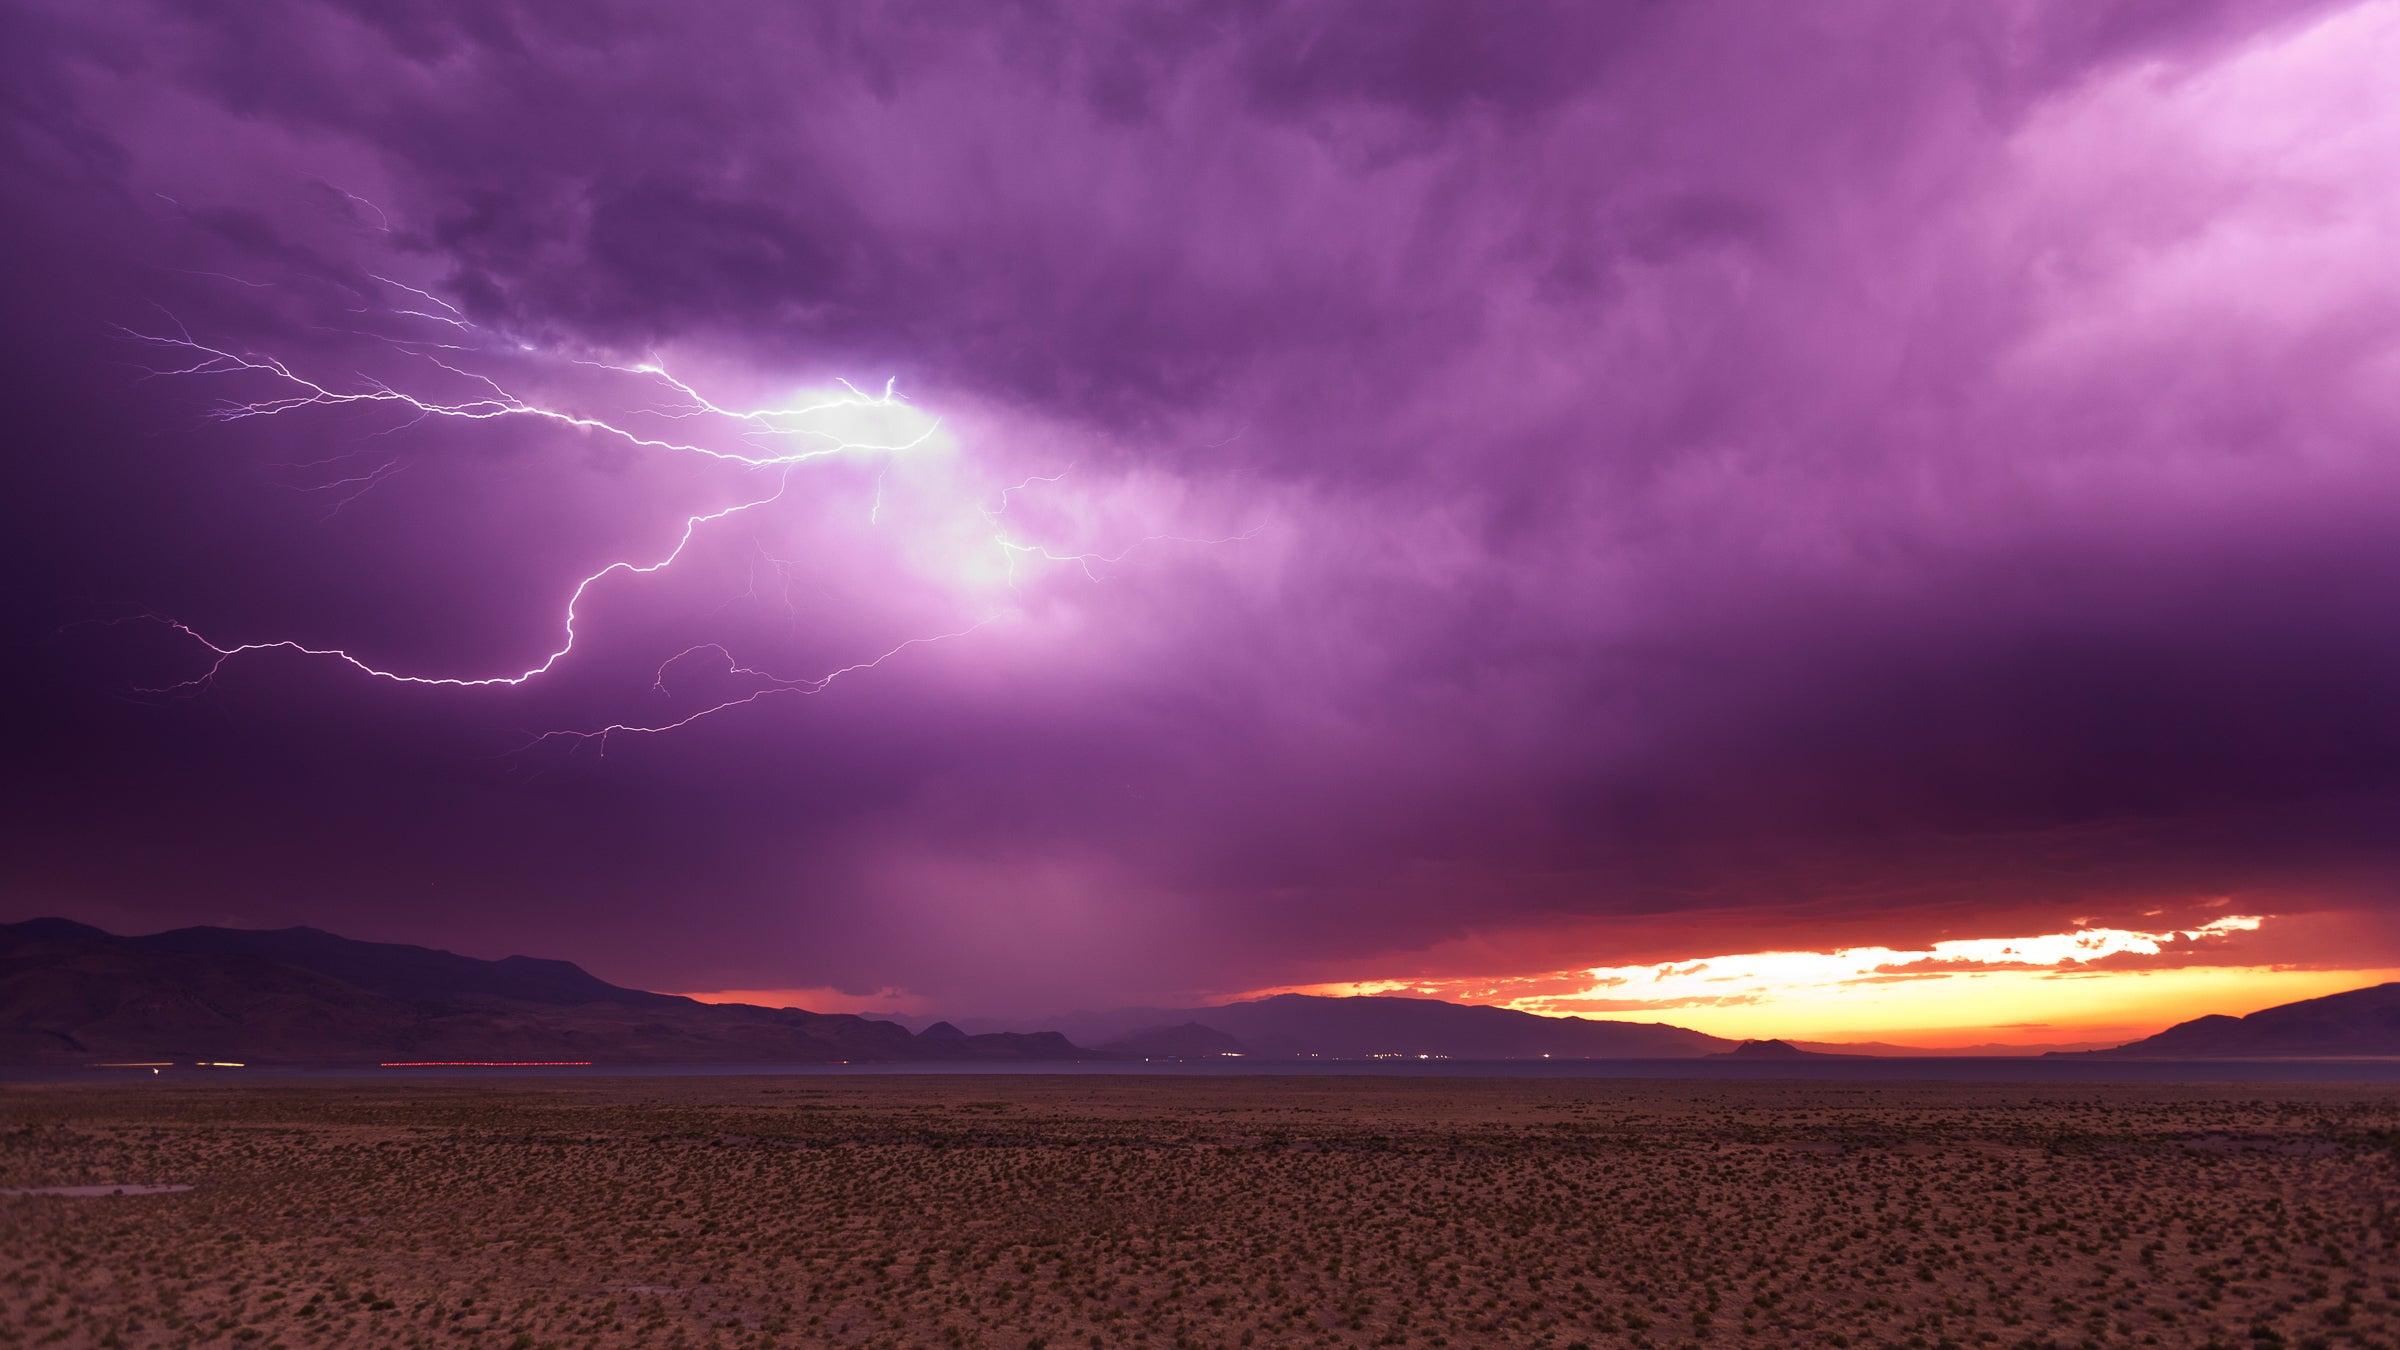 Lightning storm at dusk over Pyramid Lake, Nevada.